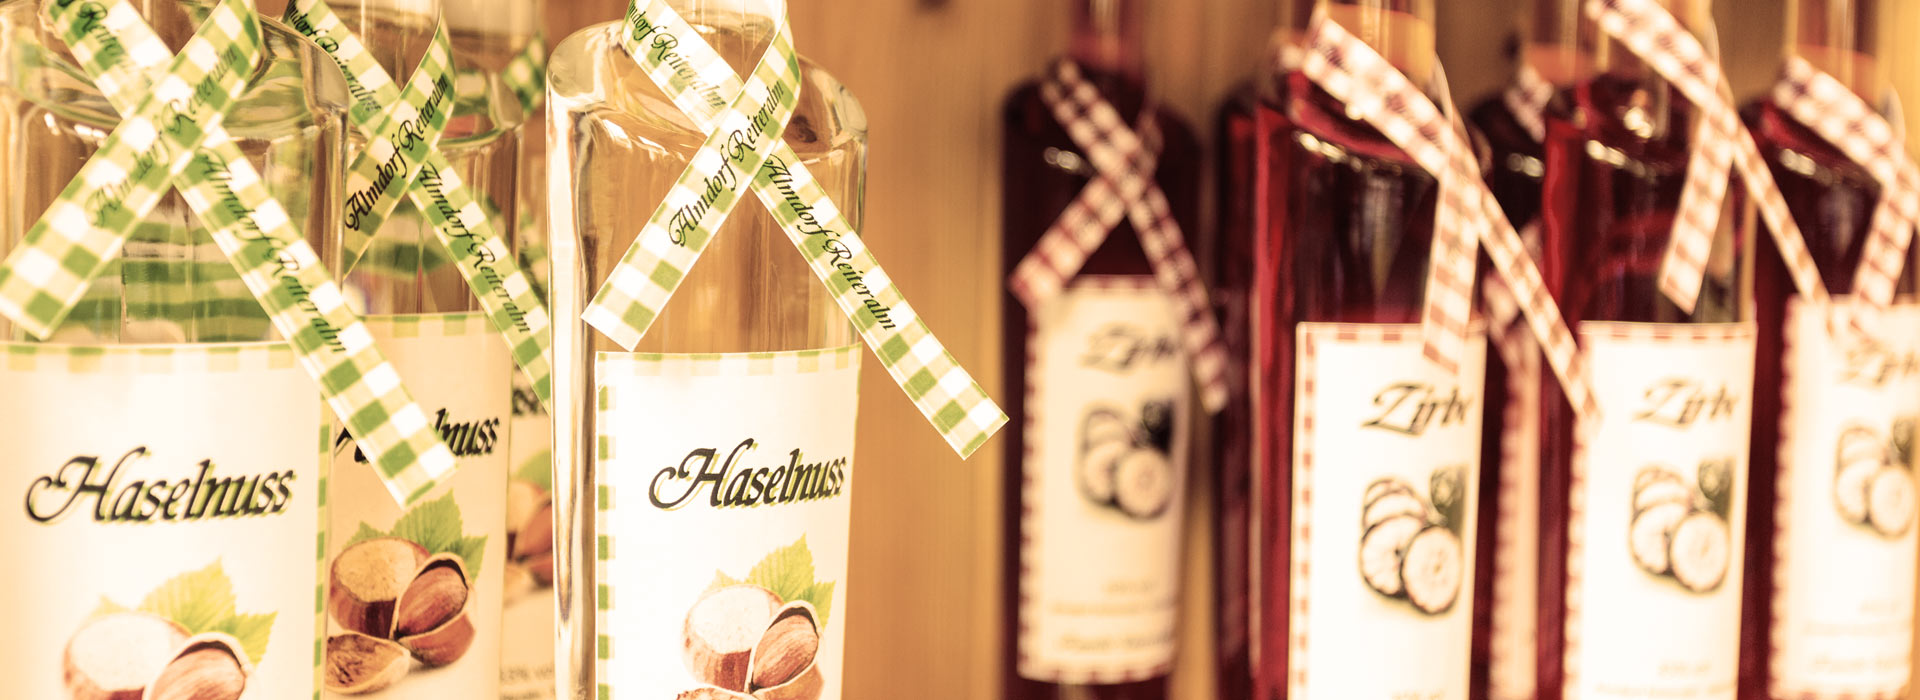 Almdorf-alcohol